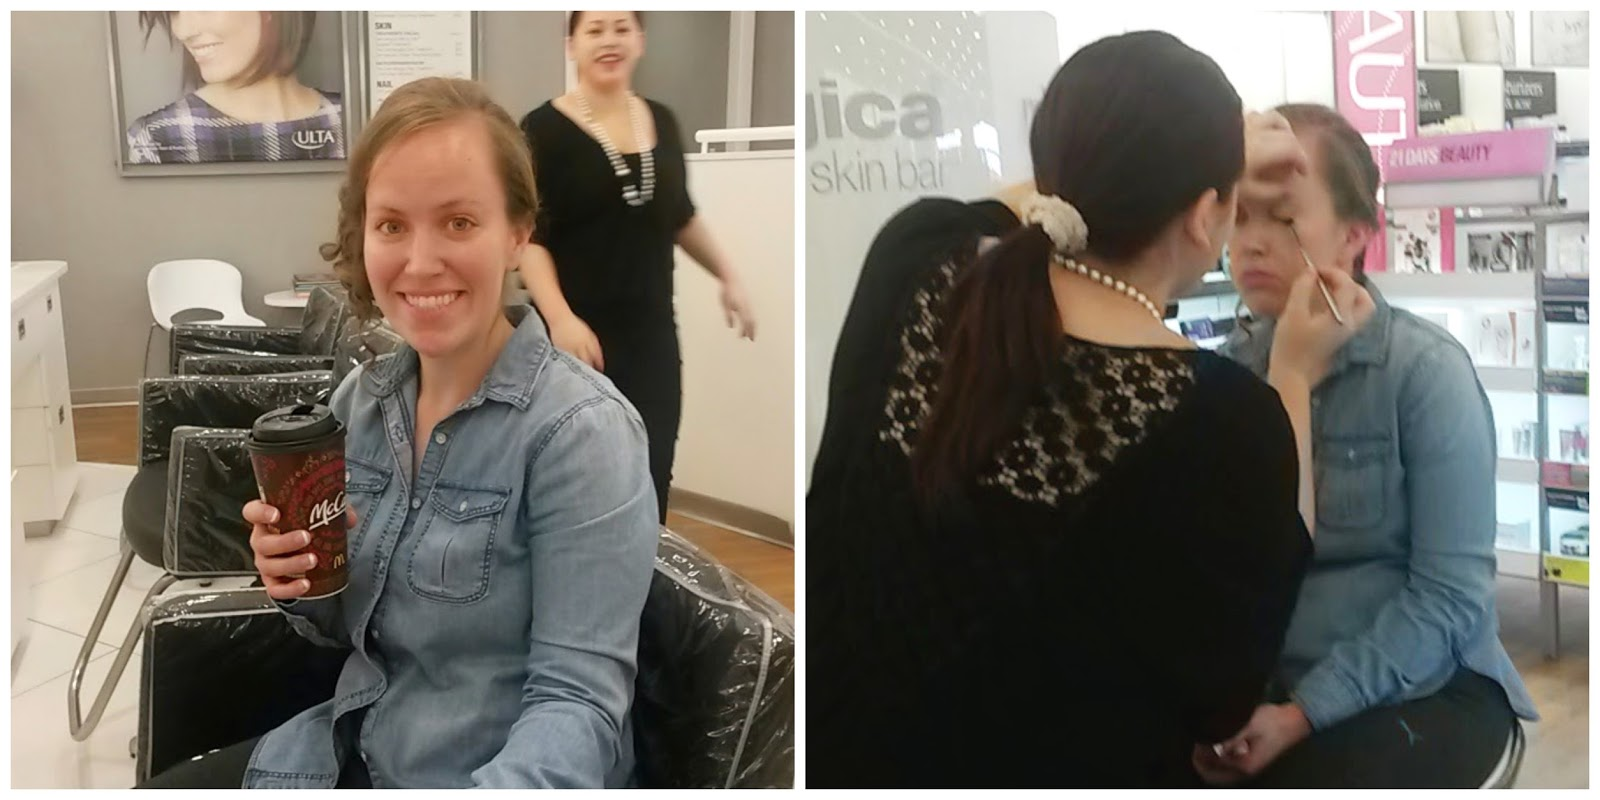 ulta for wedding make-up - crossing mason dixon